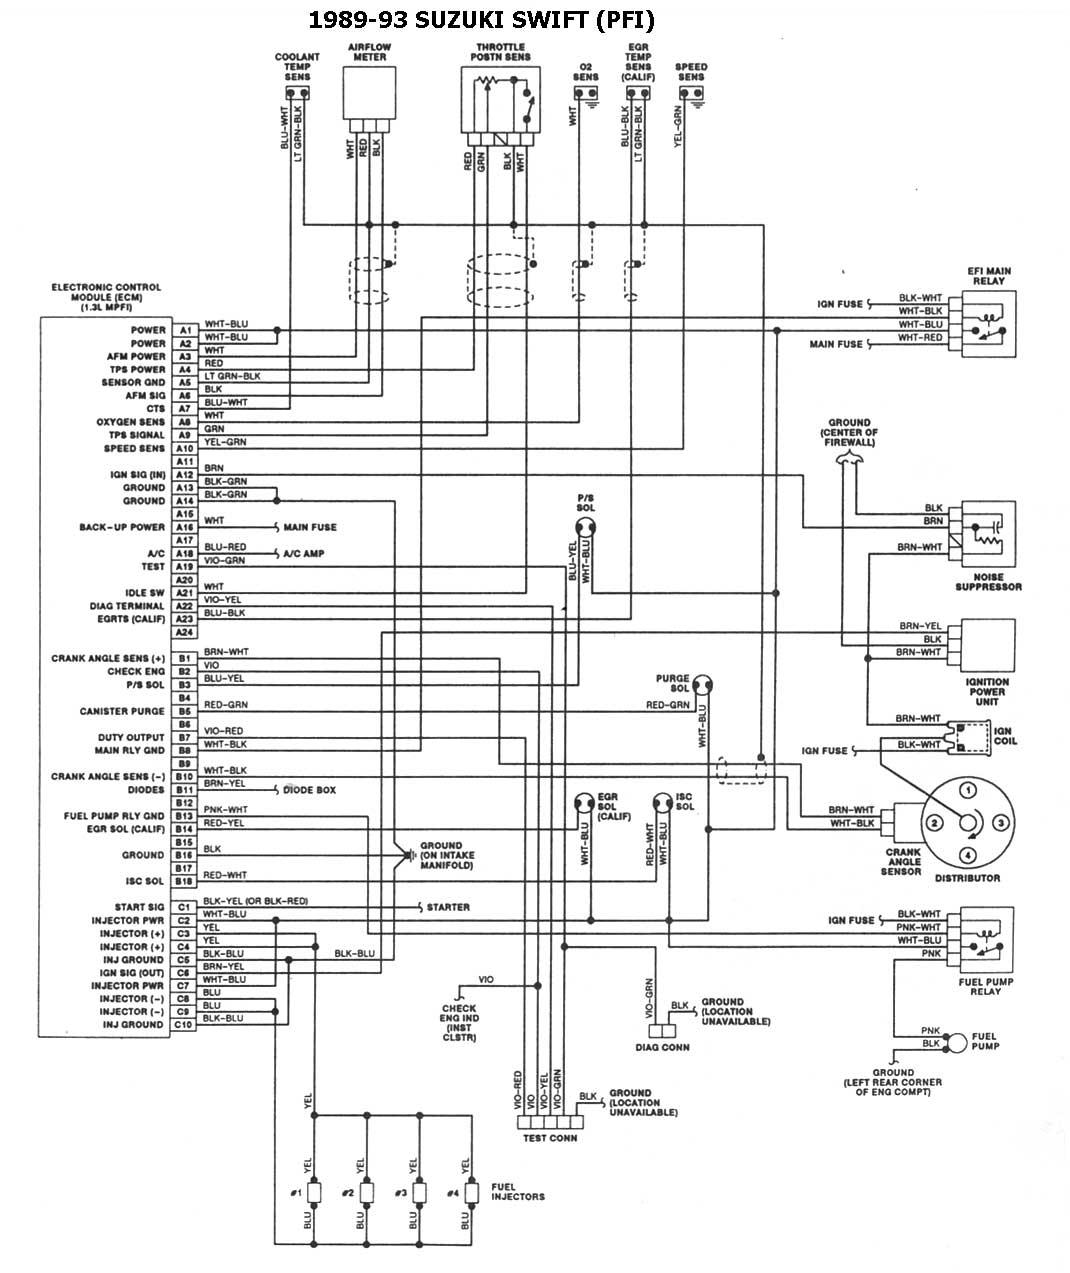 87 Suzuki Samurai Wiring Diagram - Wiring Diagrams Folder on suzuki samurai ignition switch, suzuki samurai cooling system diagram, suzuki samurai starter wiring, suzuki samurai engine wiring diagram,